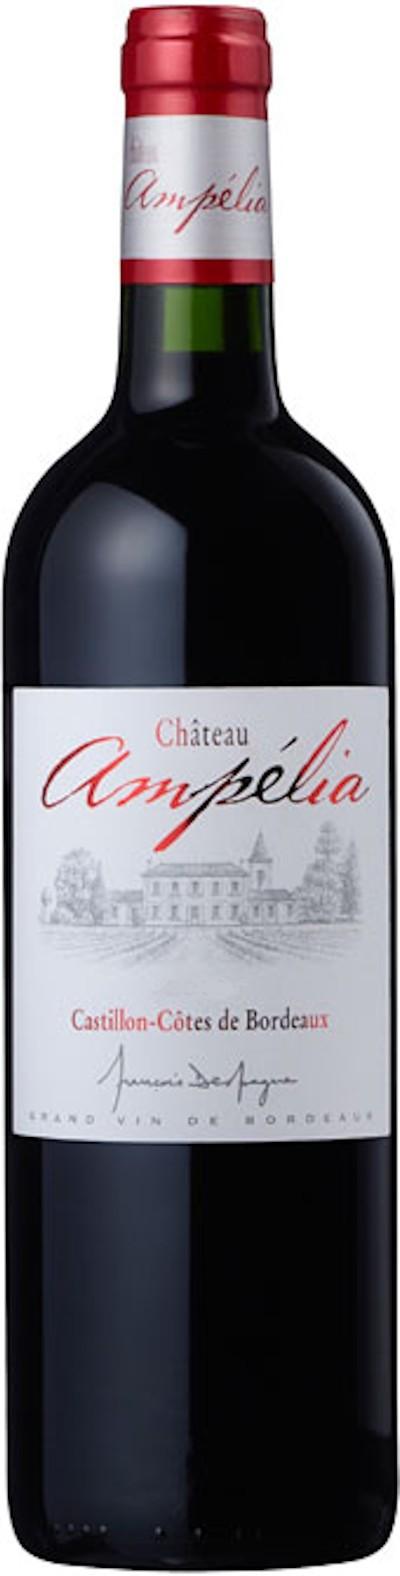 Chateau Ampelia - Cotes de Castillon Magnum, 2004